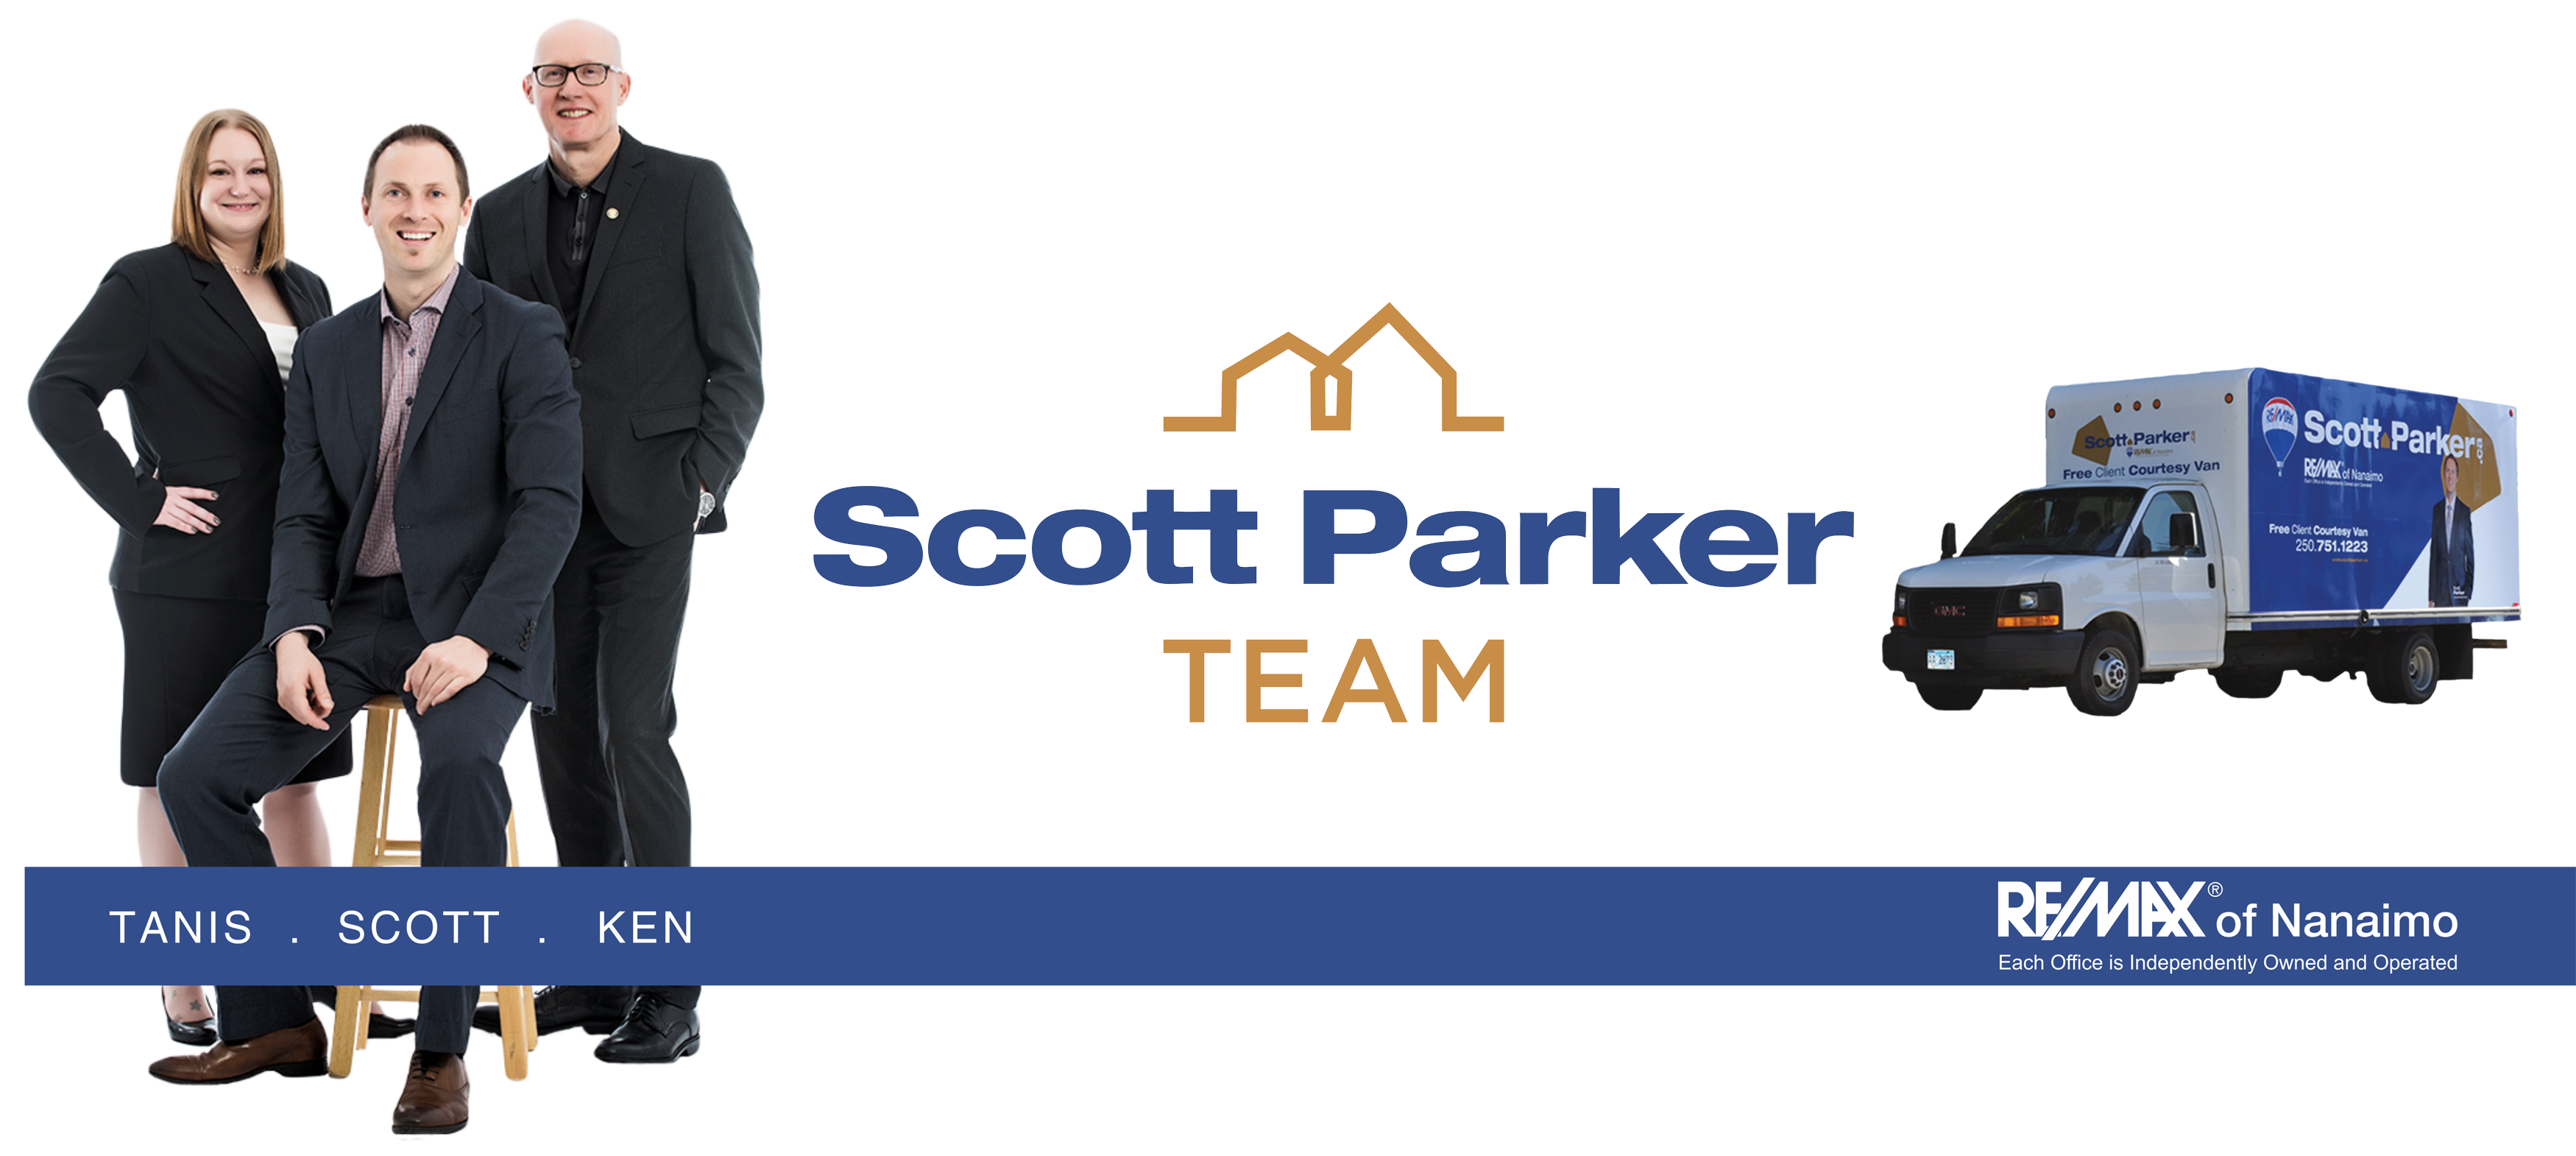 The Scott Parker Team